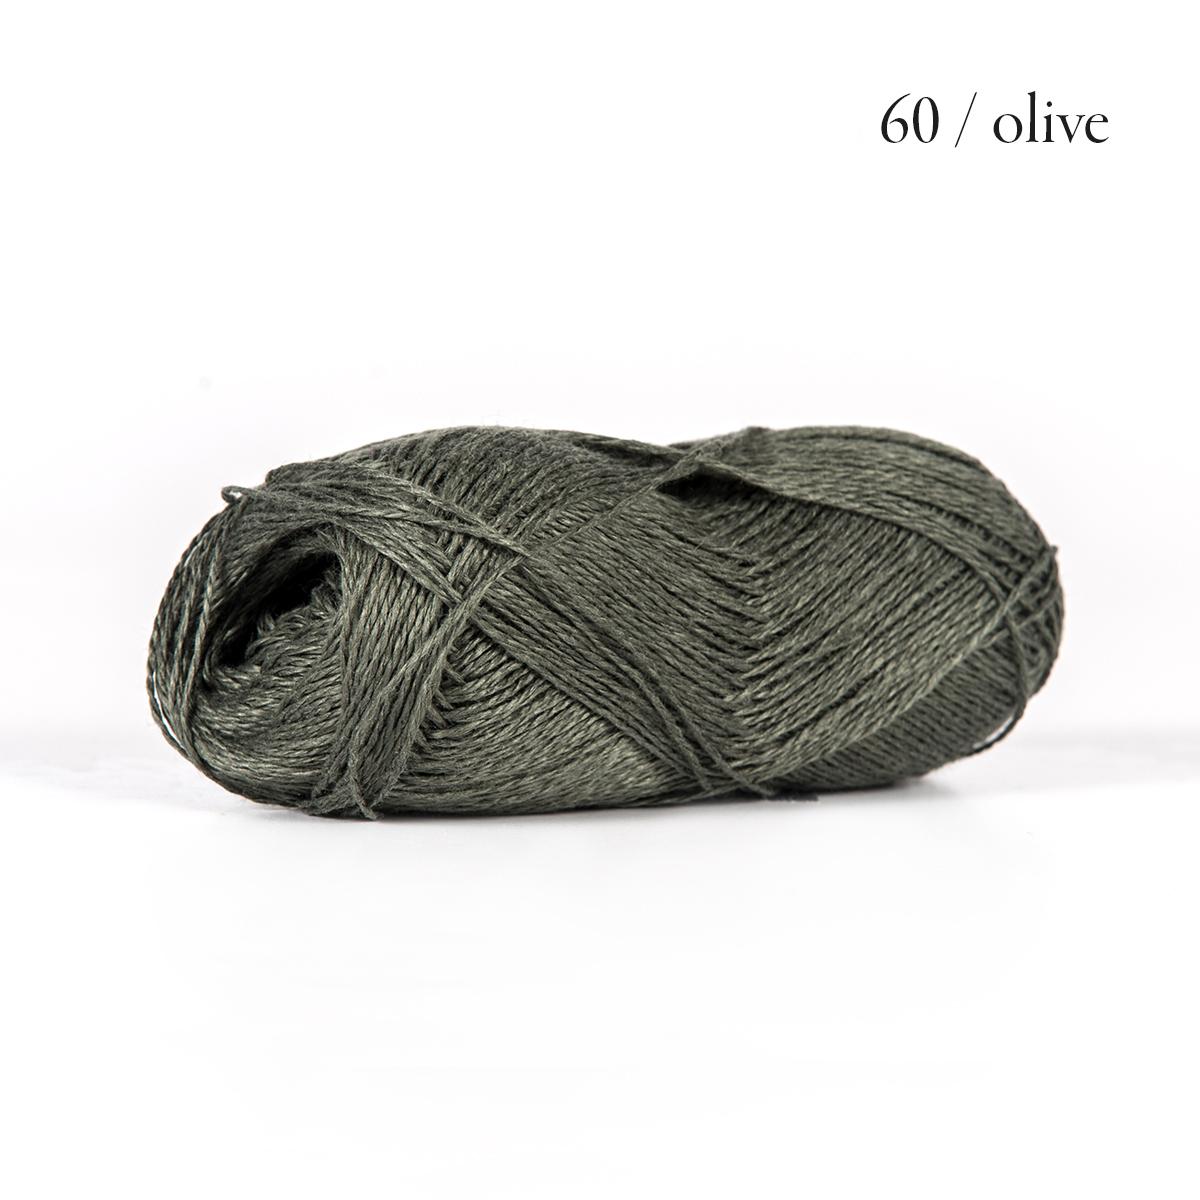 Lino_60 olive.jpg